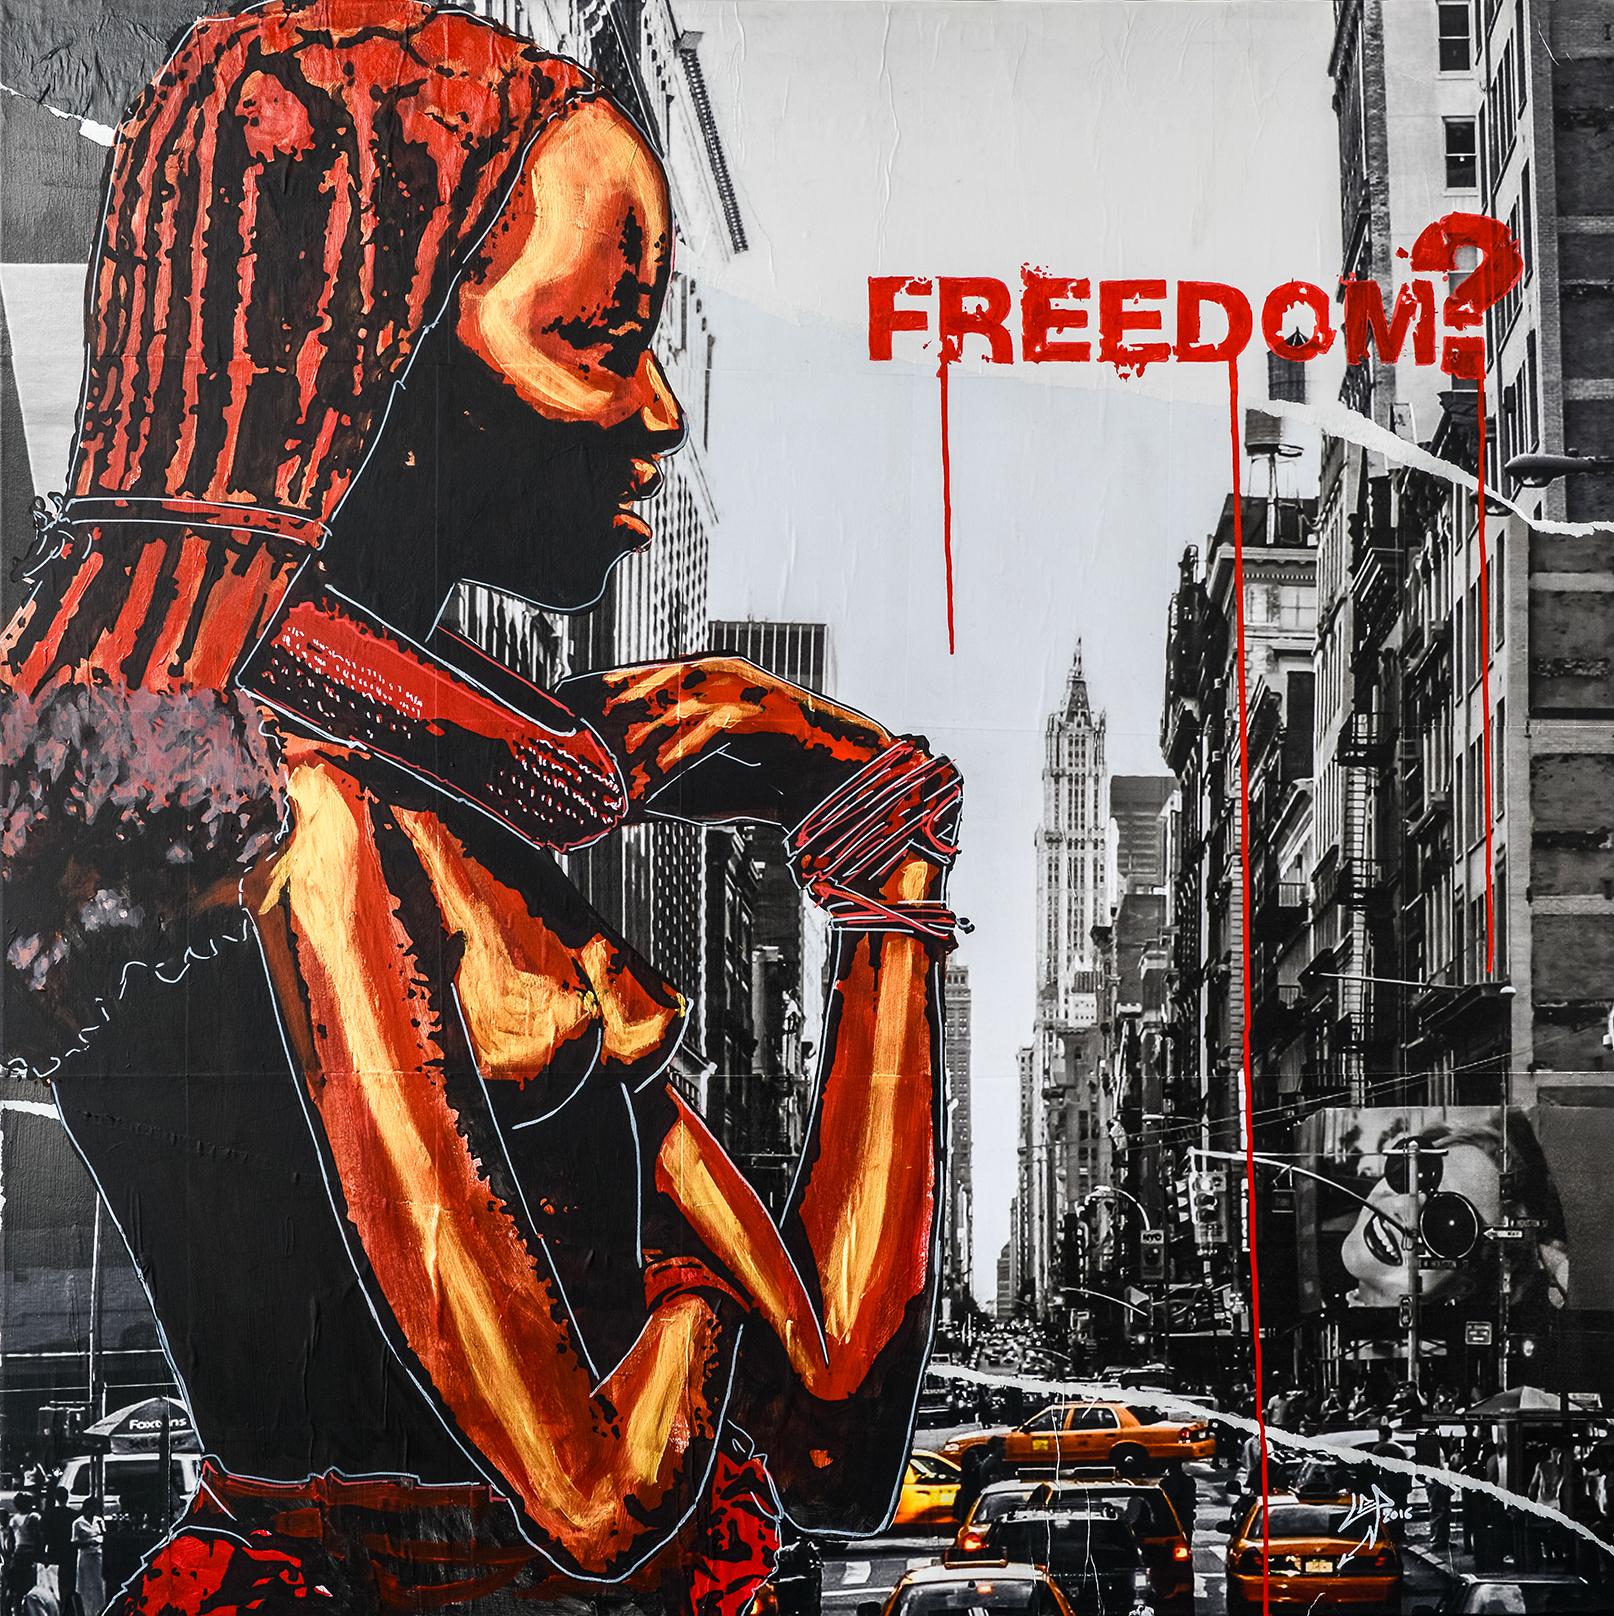 89 #FREEDOM? /© Loic Ercolessi